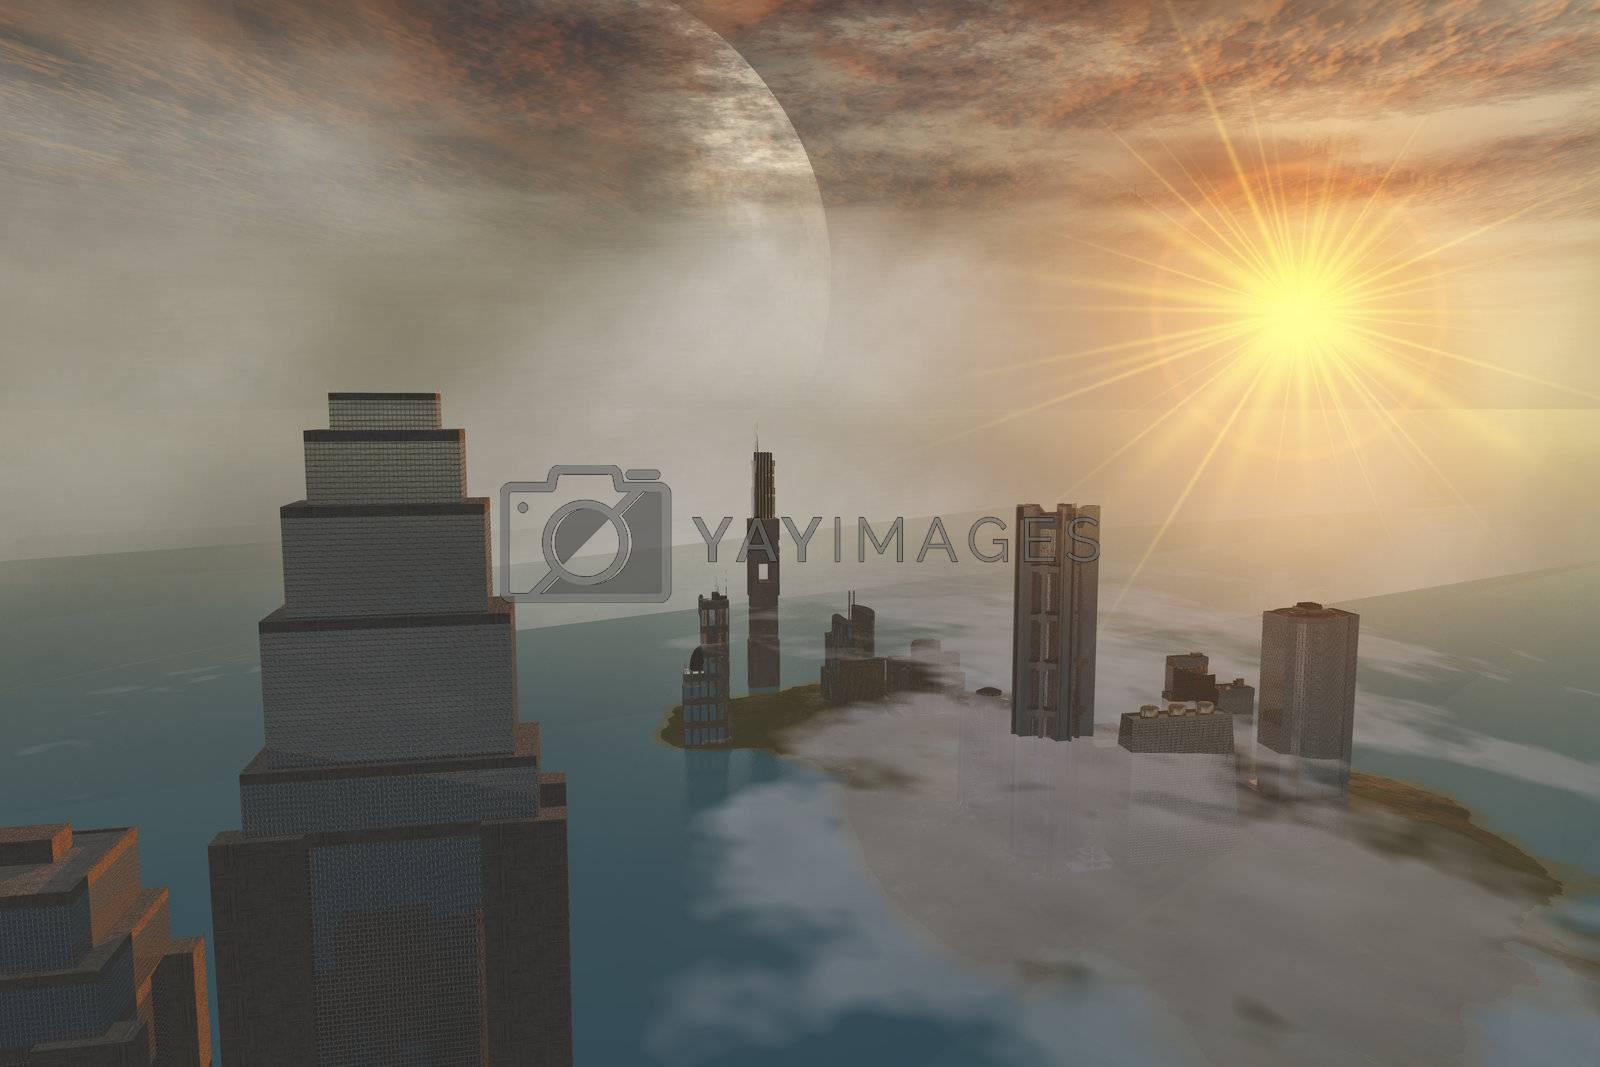 Royalty free image of CZAR CITY by Catmando